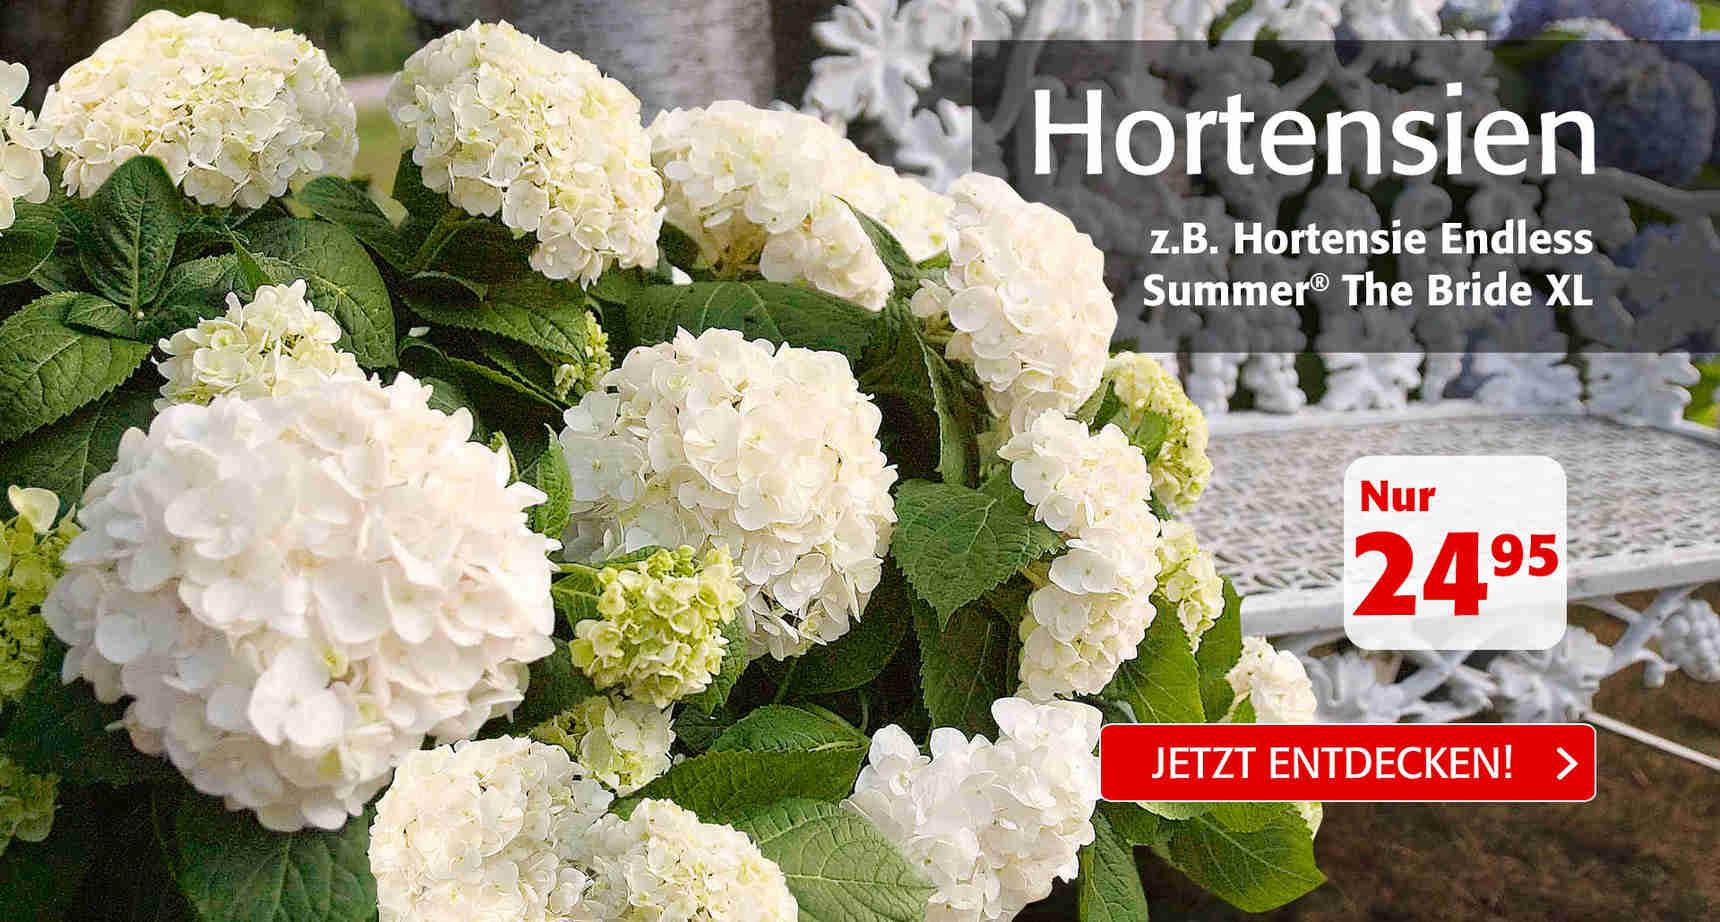 +++ (1) Hortensien +++ - 3